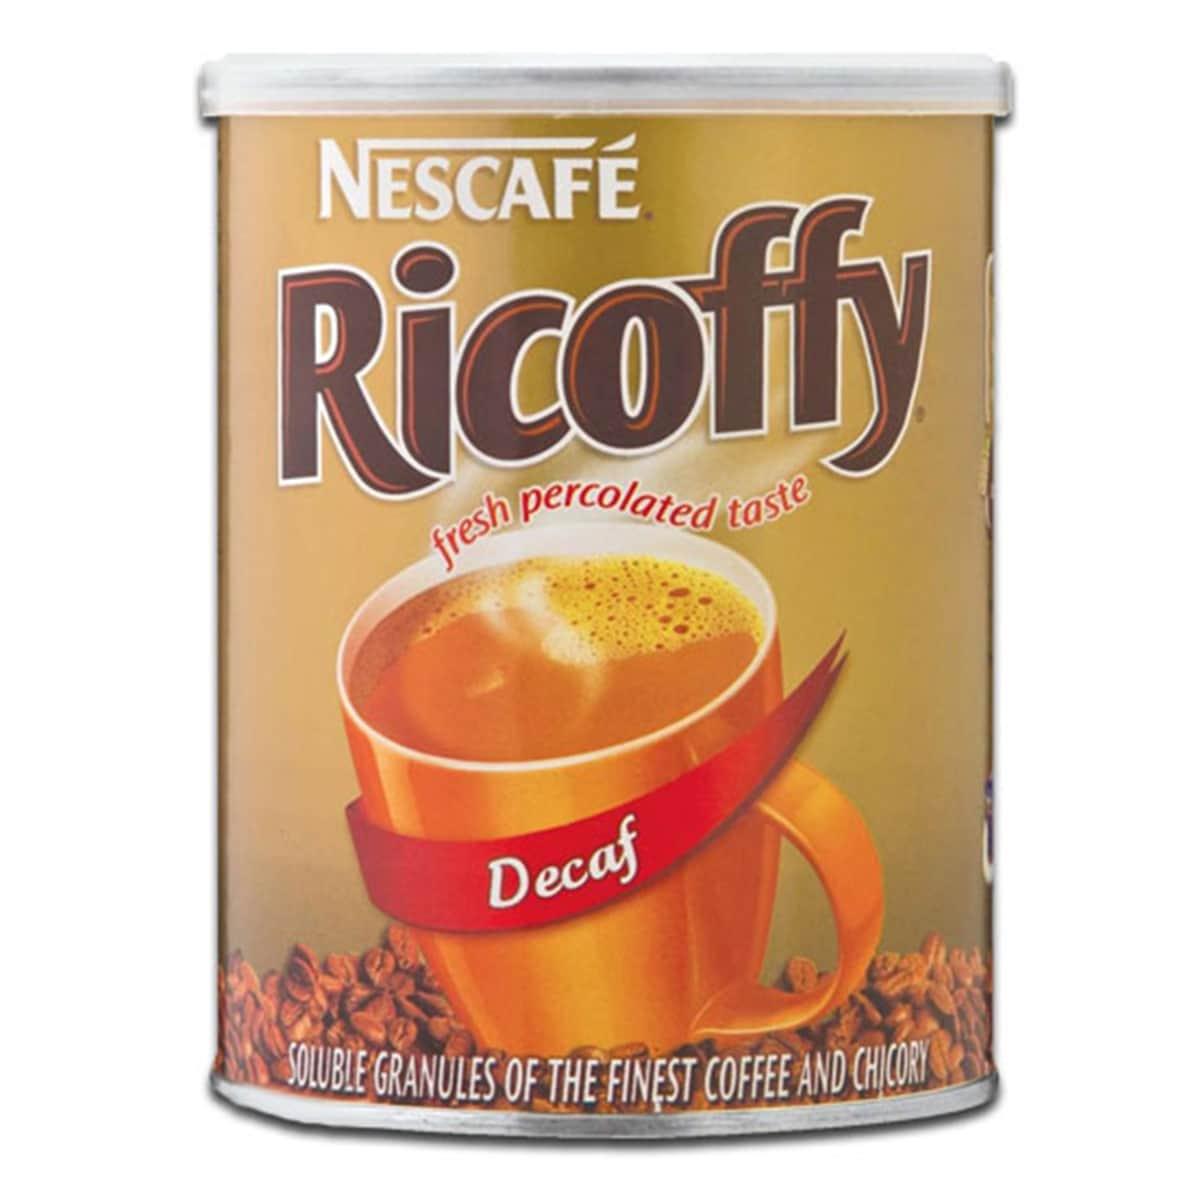 Buy Nestle Nescafe Ricoffy Decaf (Fresh Percolated Taste) - 250 gm